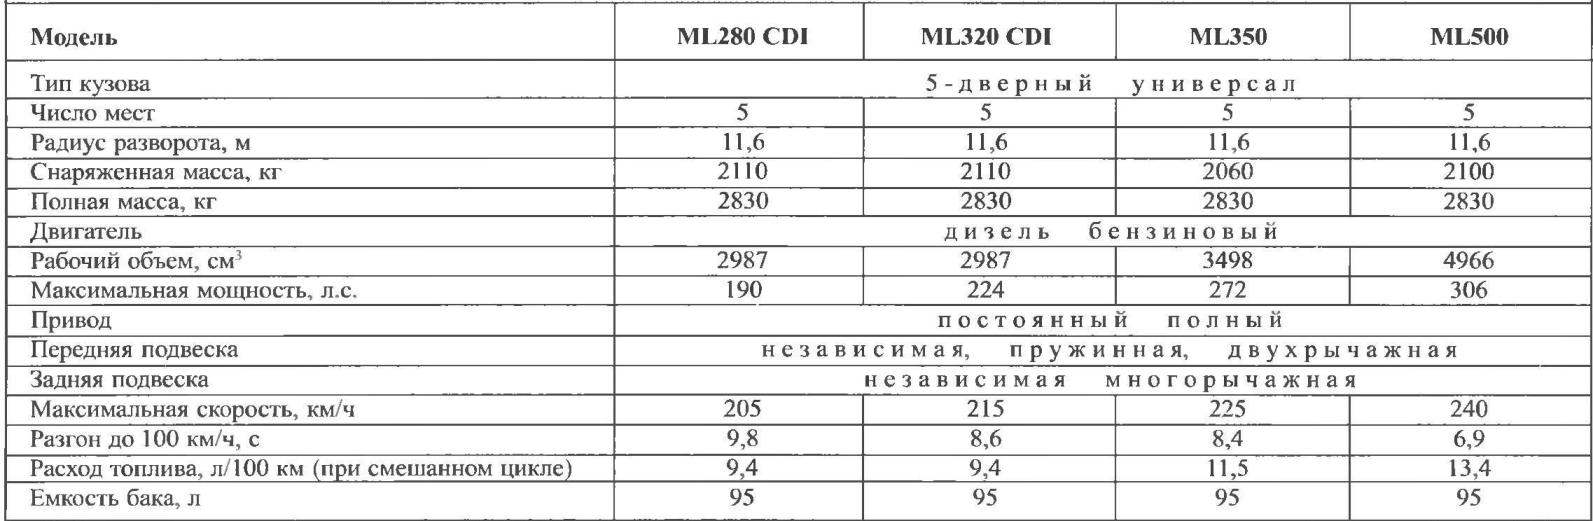 Технические характеристики автомобилей MERCEDES-BENZ ML-класса